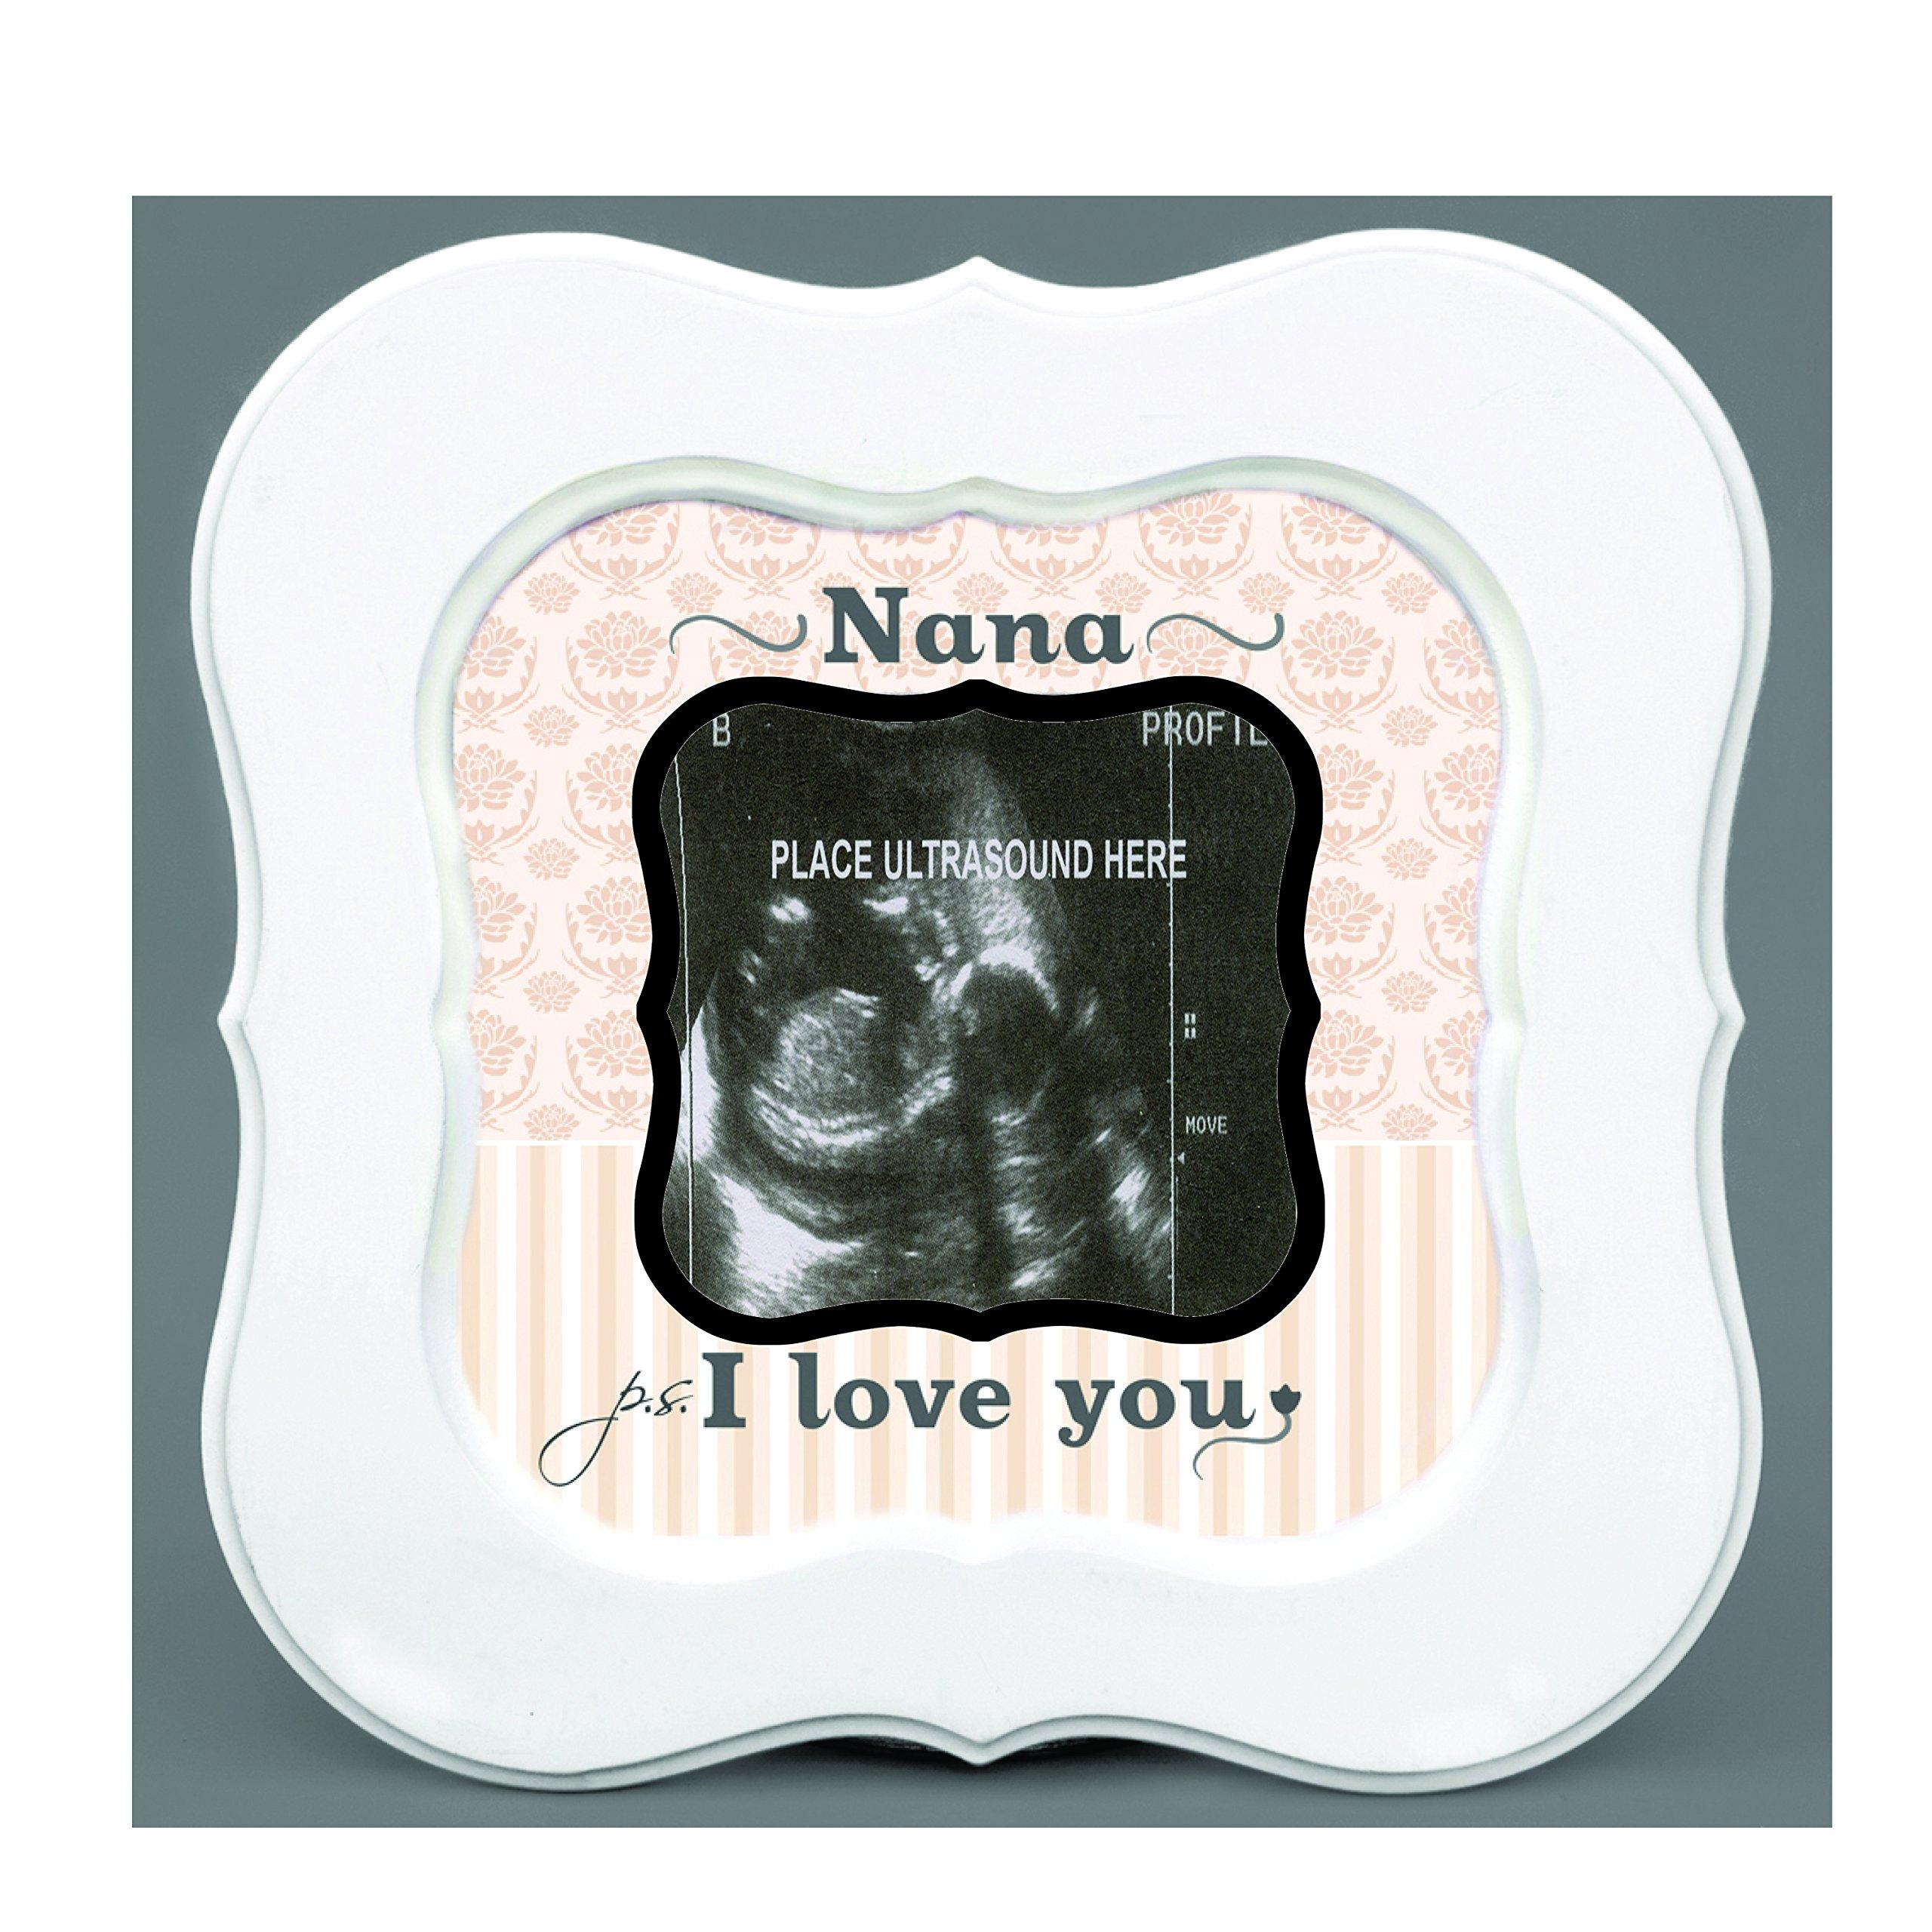 Amazon.com : Mimi Ultrasound Sonogram Frame P.S. I Love You : Baby